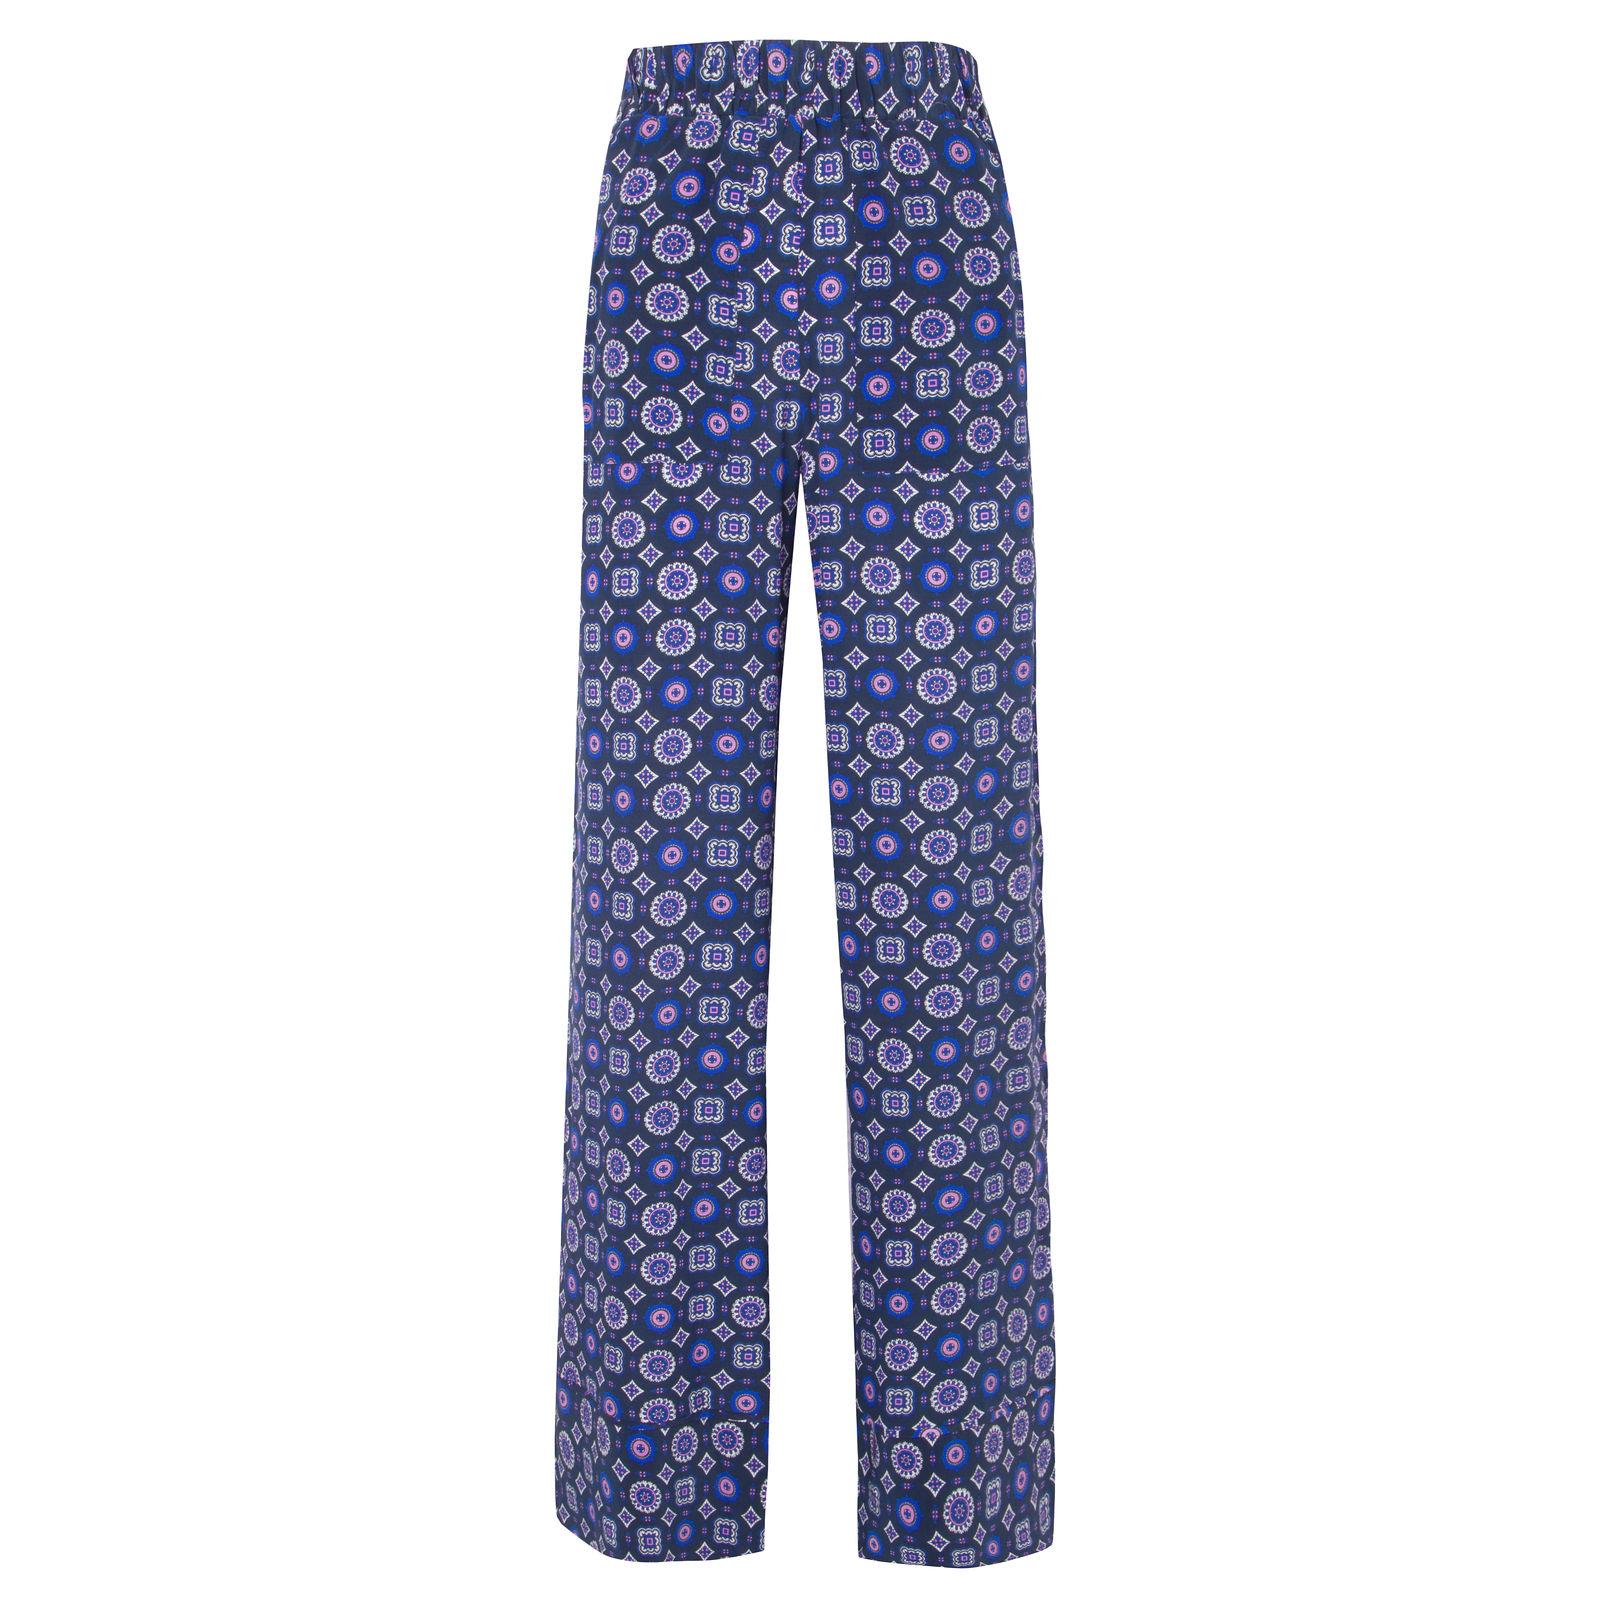 Calça Pantalona Seda Débora Magrella - Azul